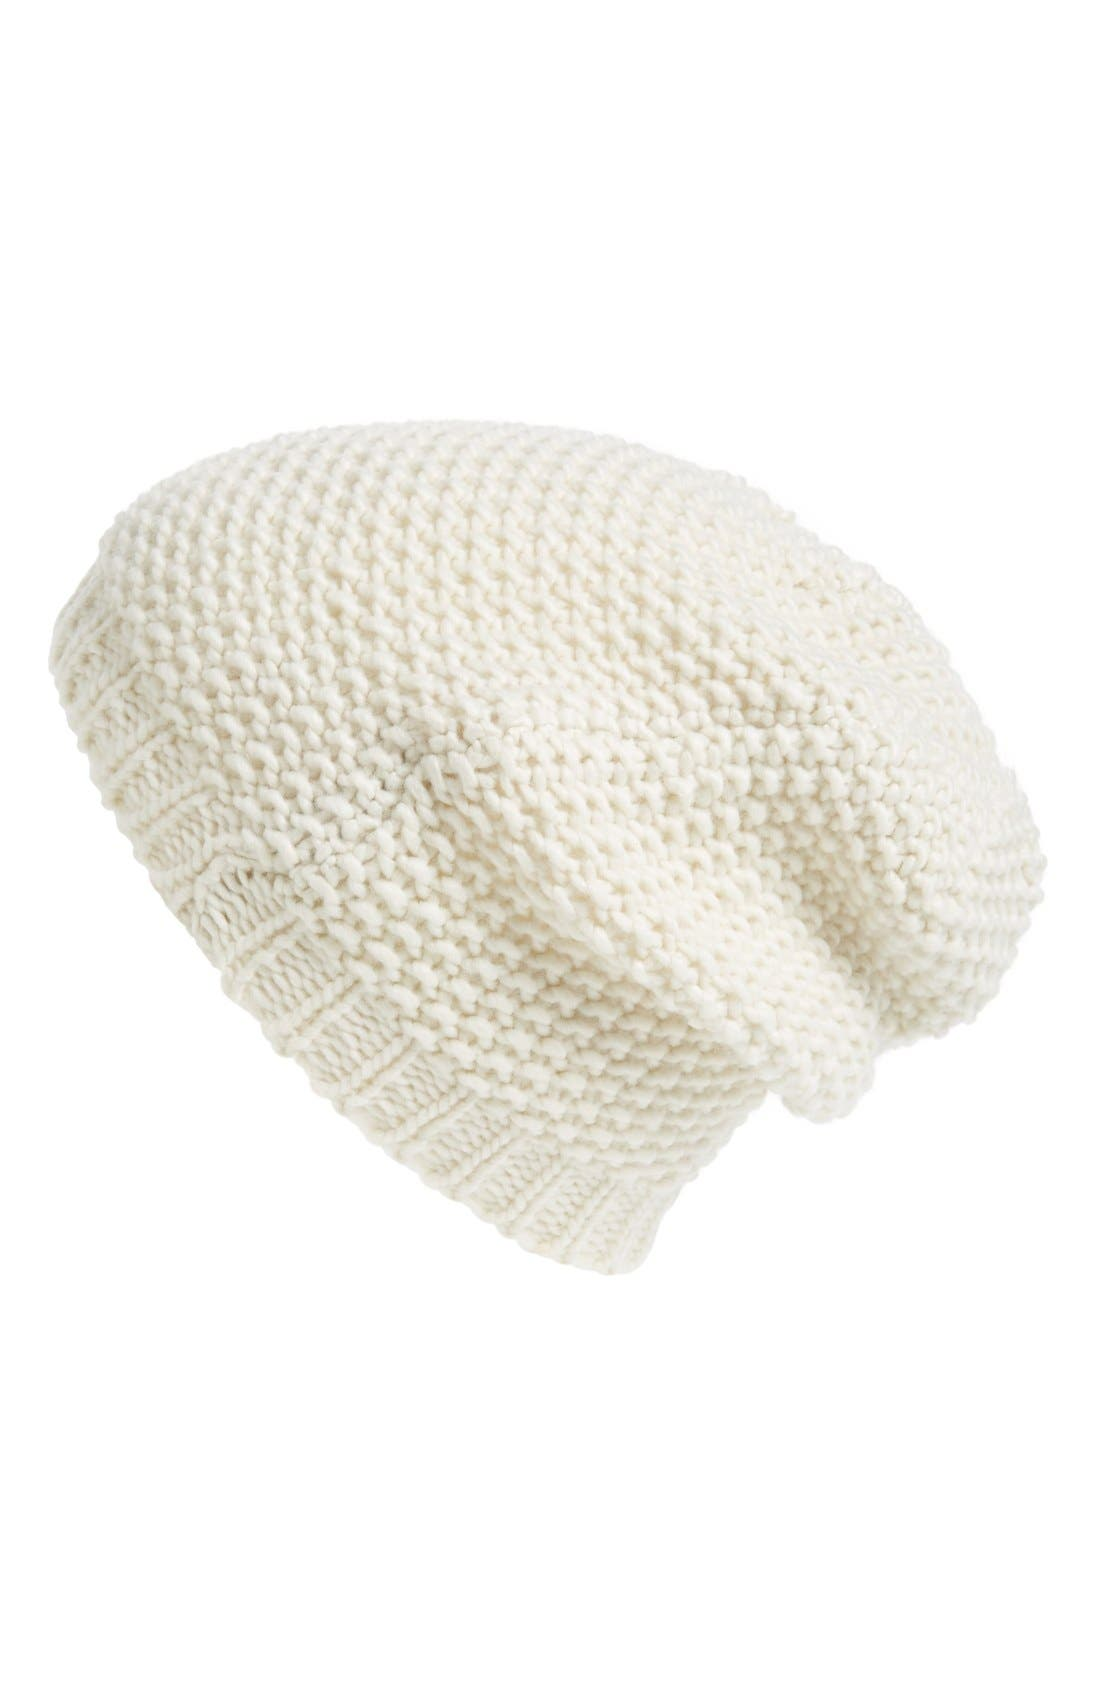 Main Image - Phase 3 Basket Knit Slouchy Beanie